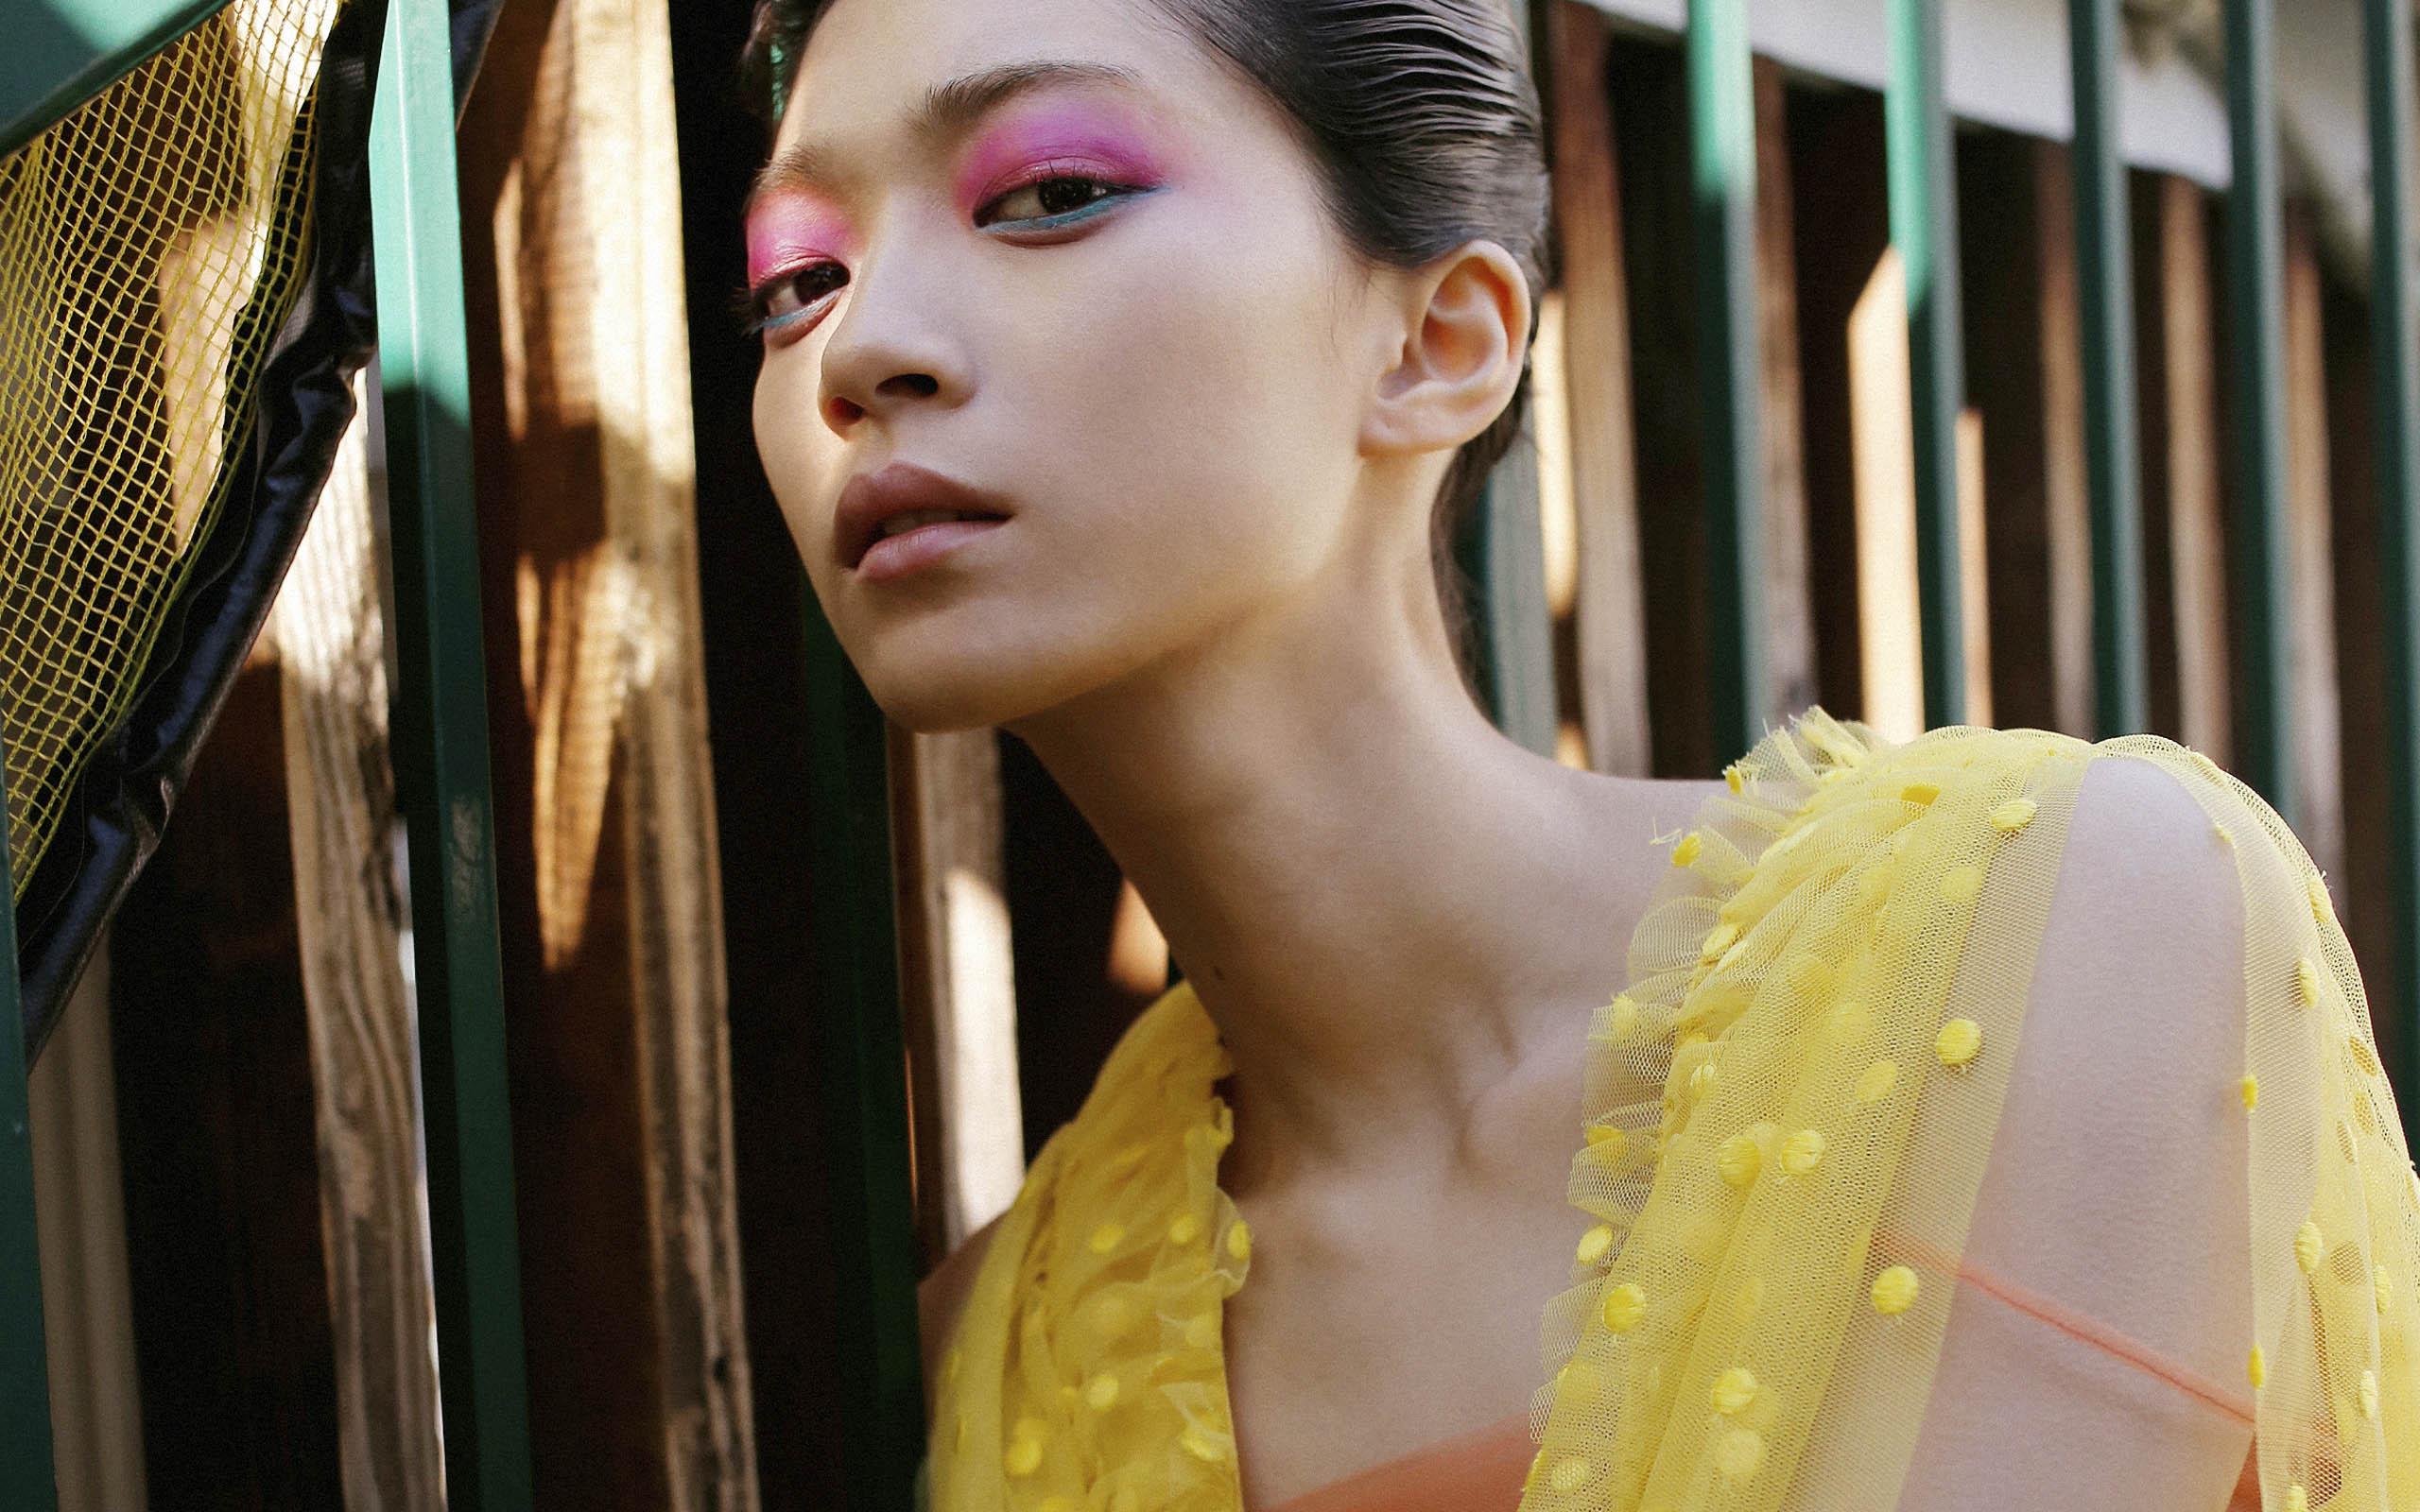 【The Look × Droptokyo】ニューフェイスモデル田中真琴と Rochas (ロシャス) の甘美なガーリー・ストリート